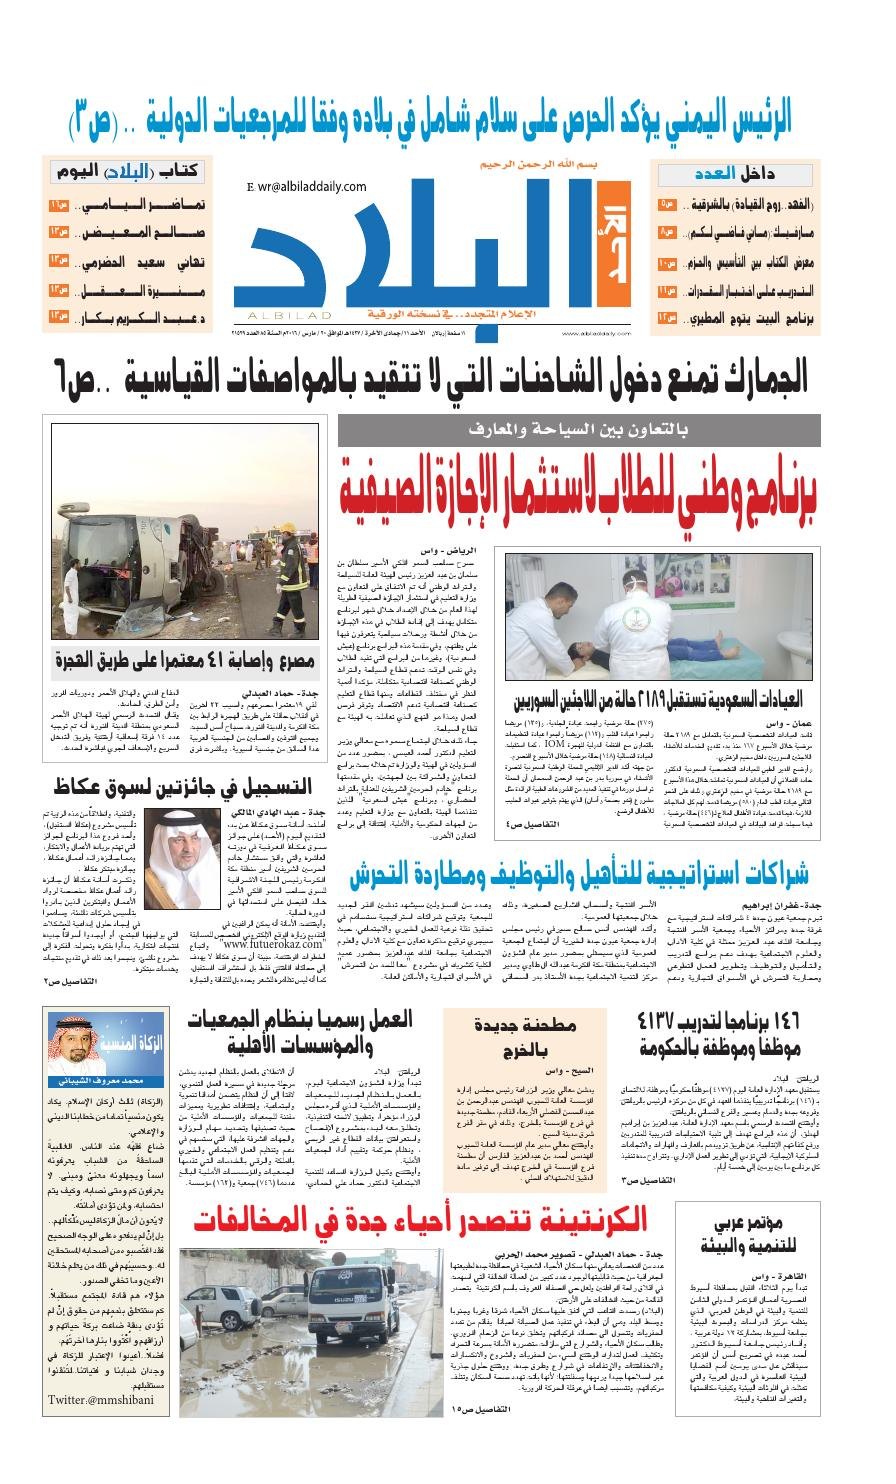 fd67205b3 Albilad 03202016 by Albilad Newspaper - issuu